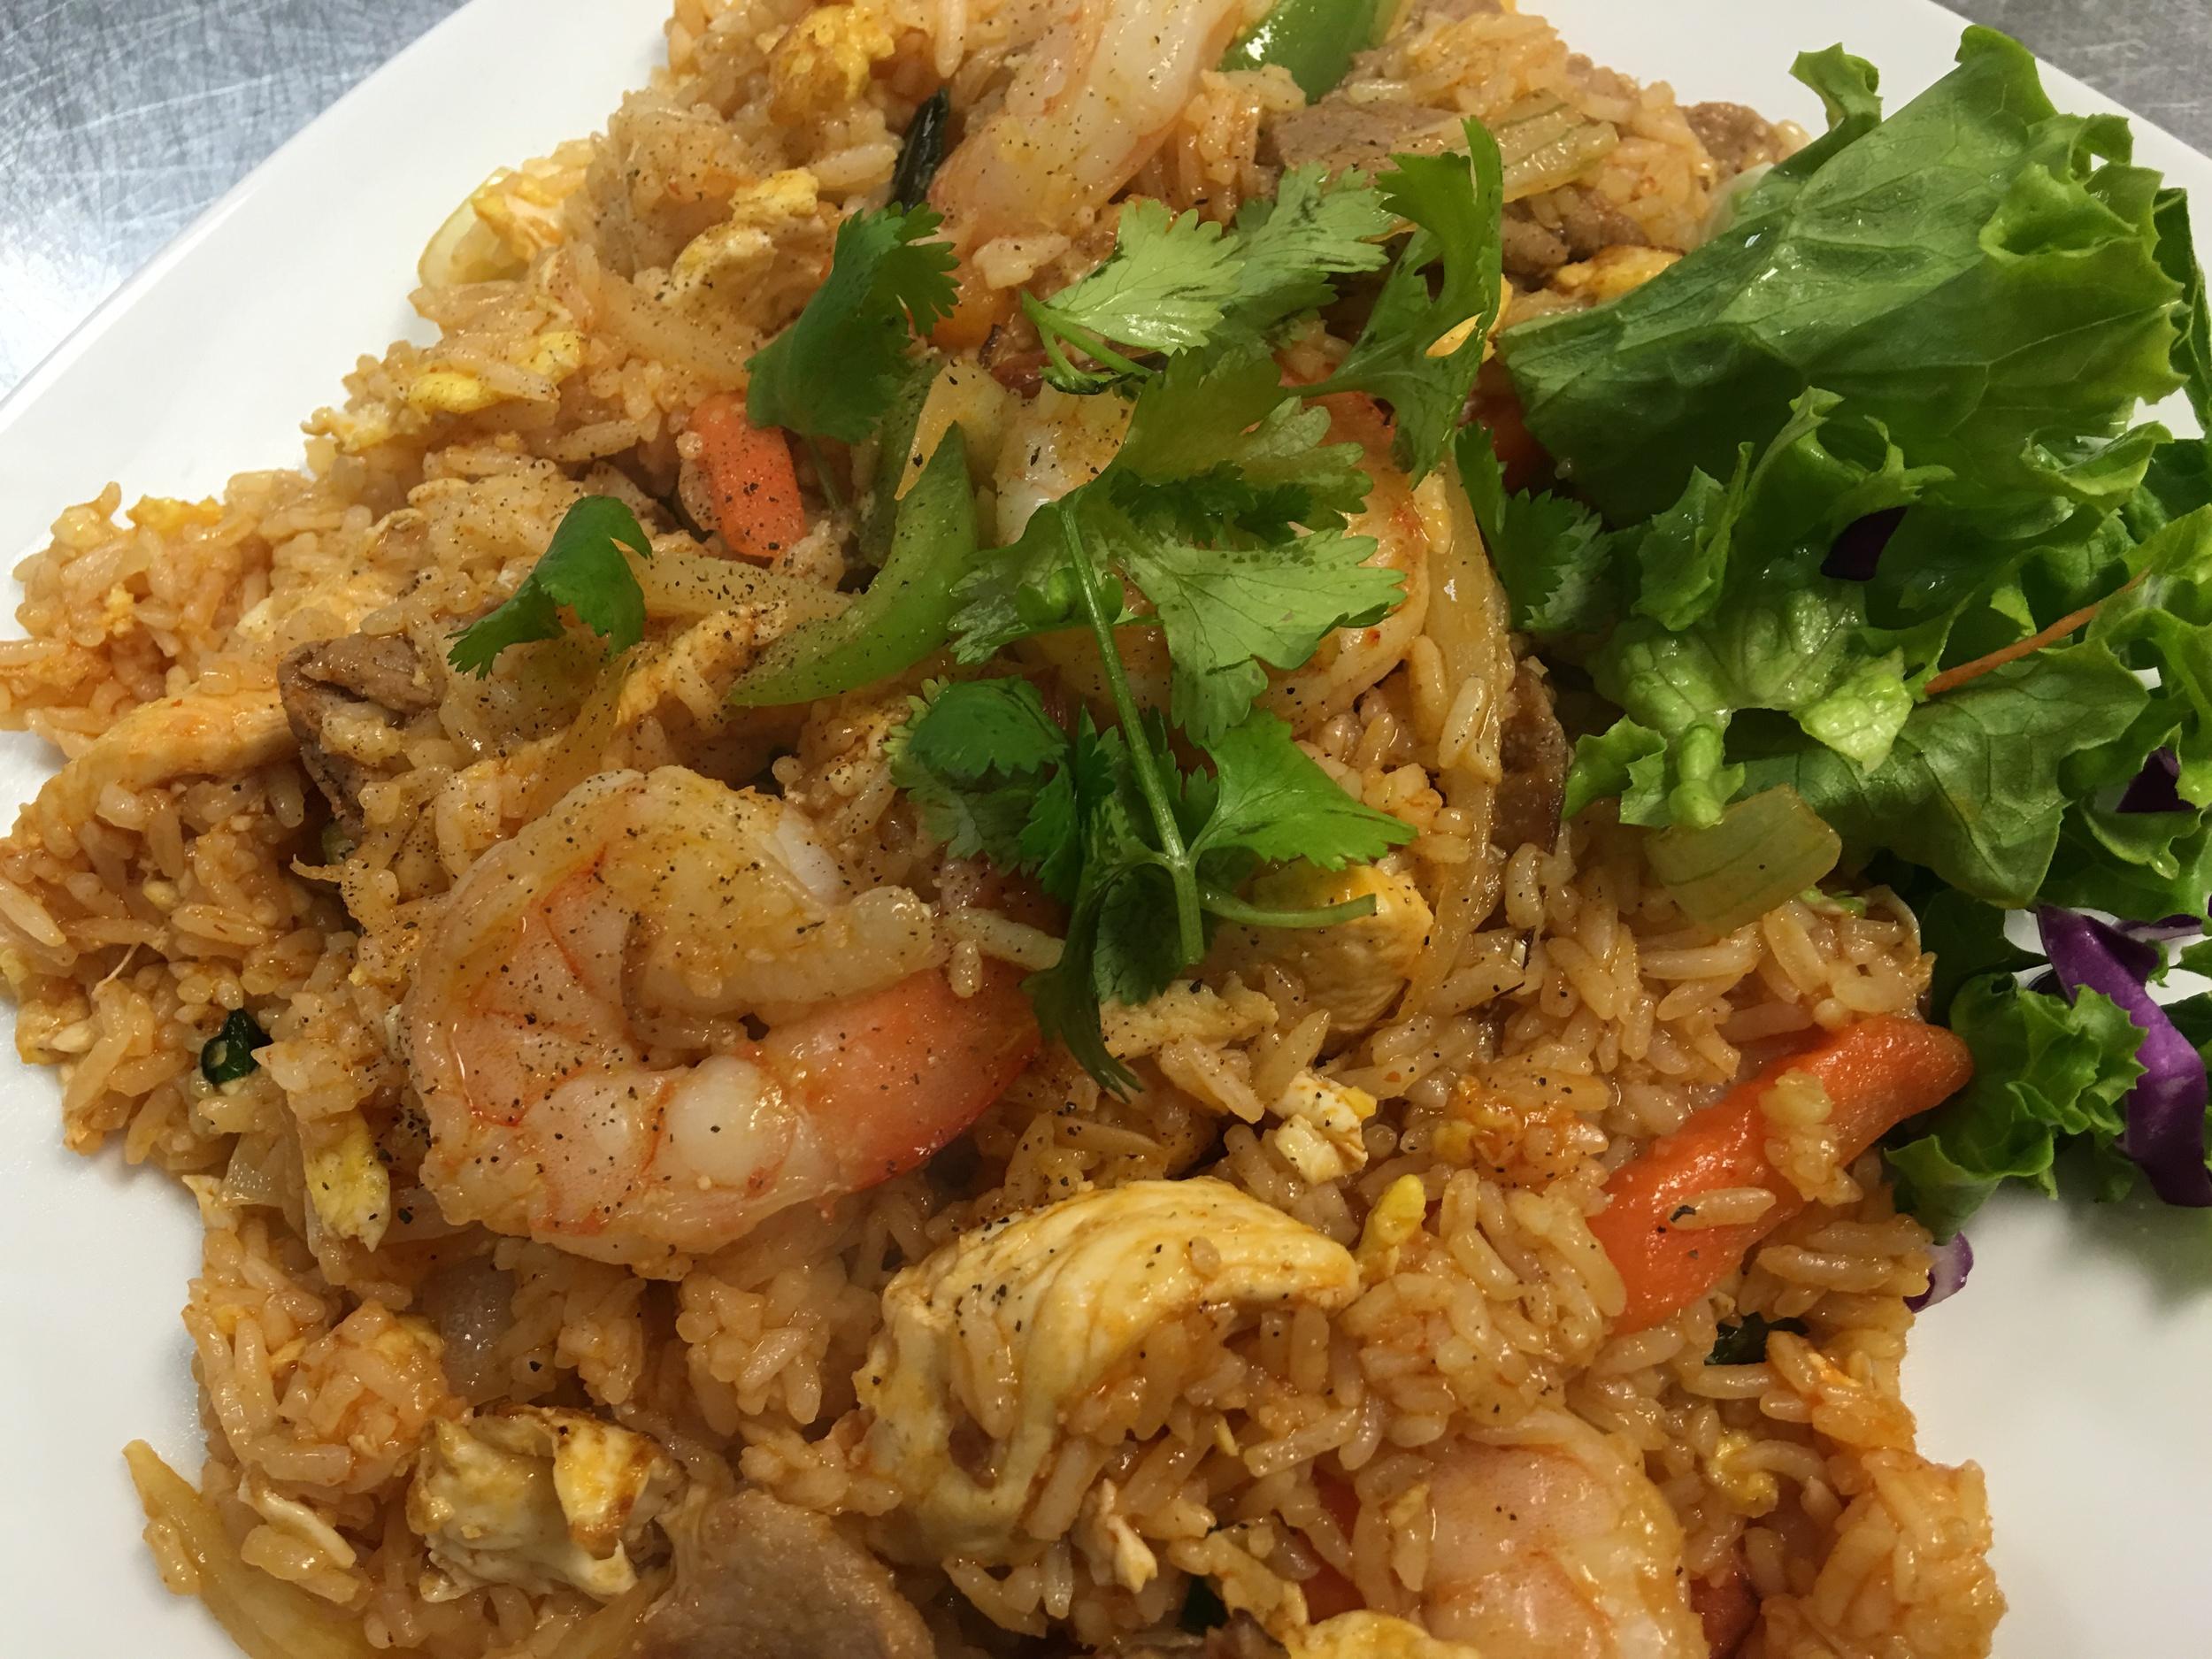 Spicy Basil Fried Rice - Shrimp